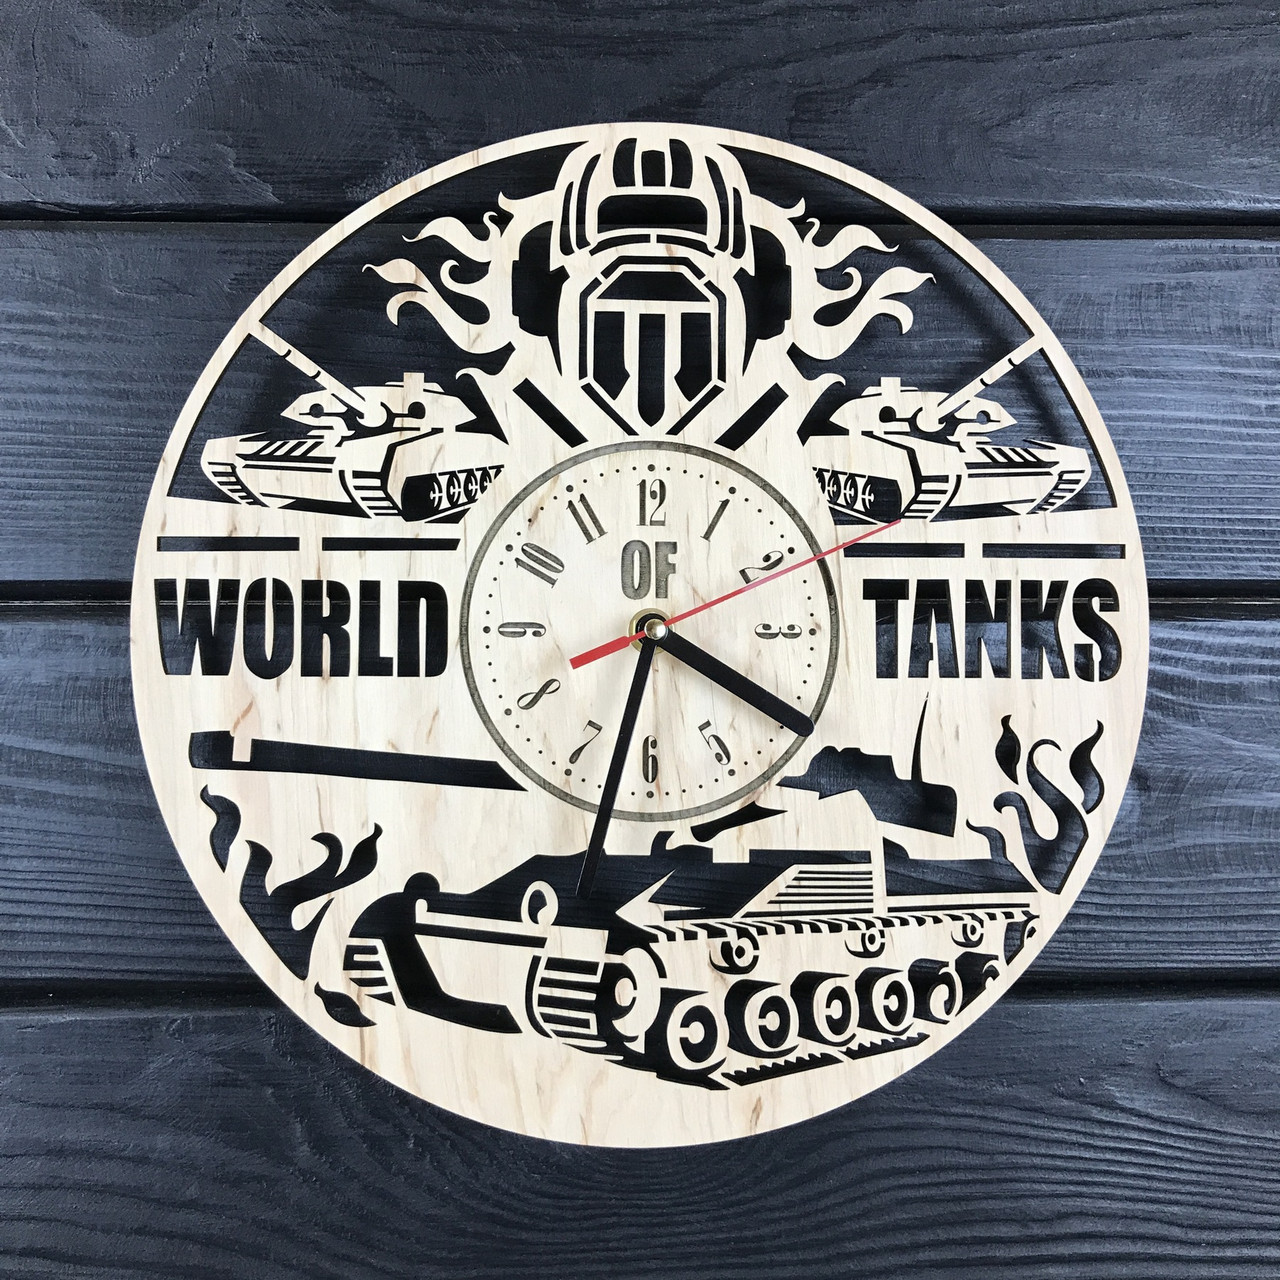 Концептуальные настенные часы из дерева «World of Tanks»